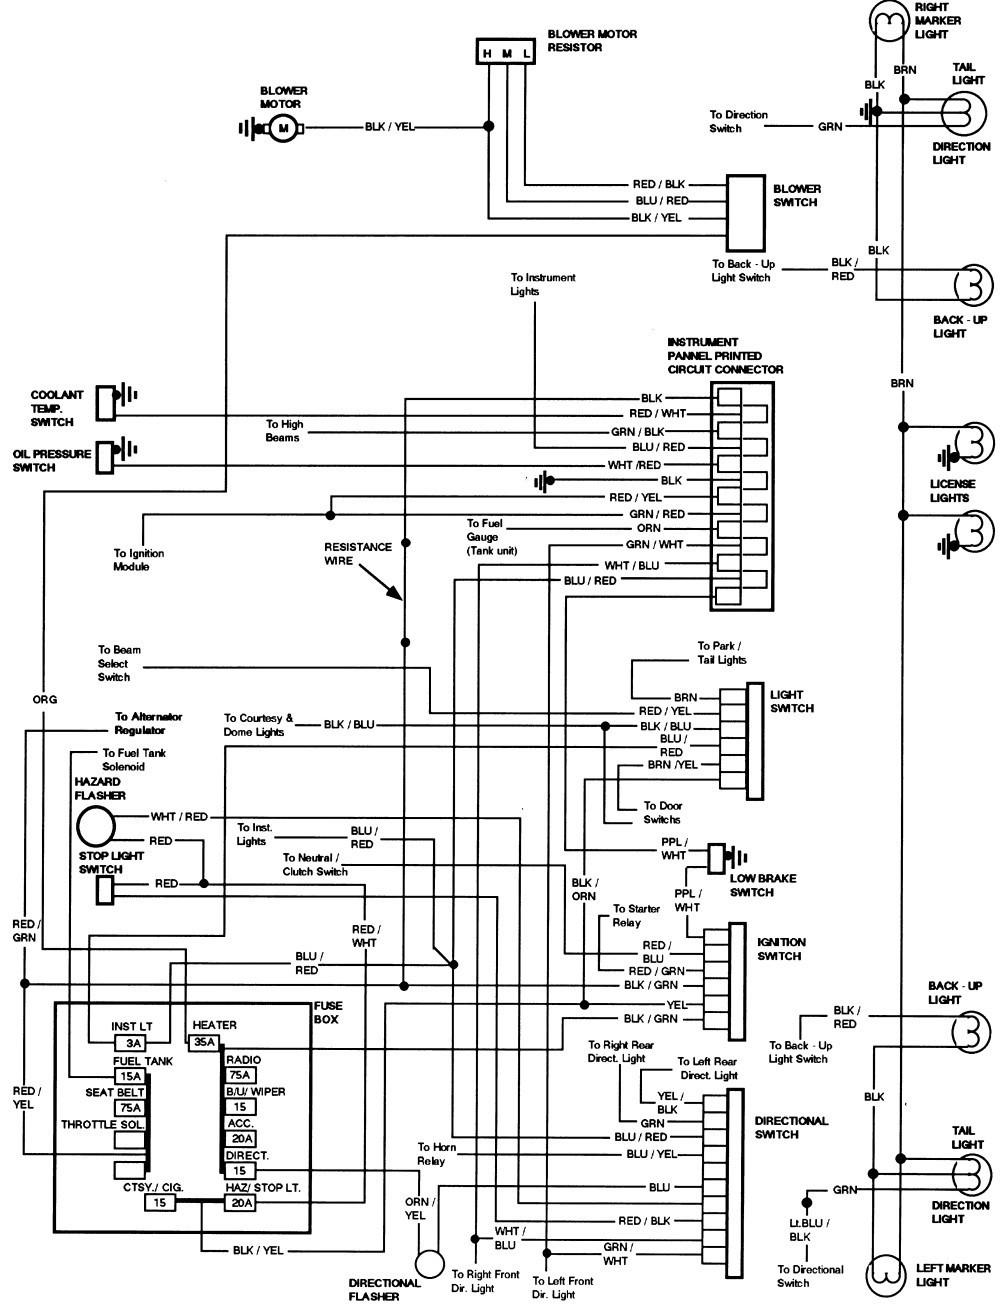 1999 Ford F 250 Fuel System Diagram Wiring Diagram Paper 1999 Ford F 150 Fuel Diagram